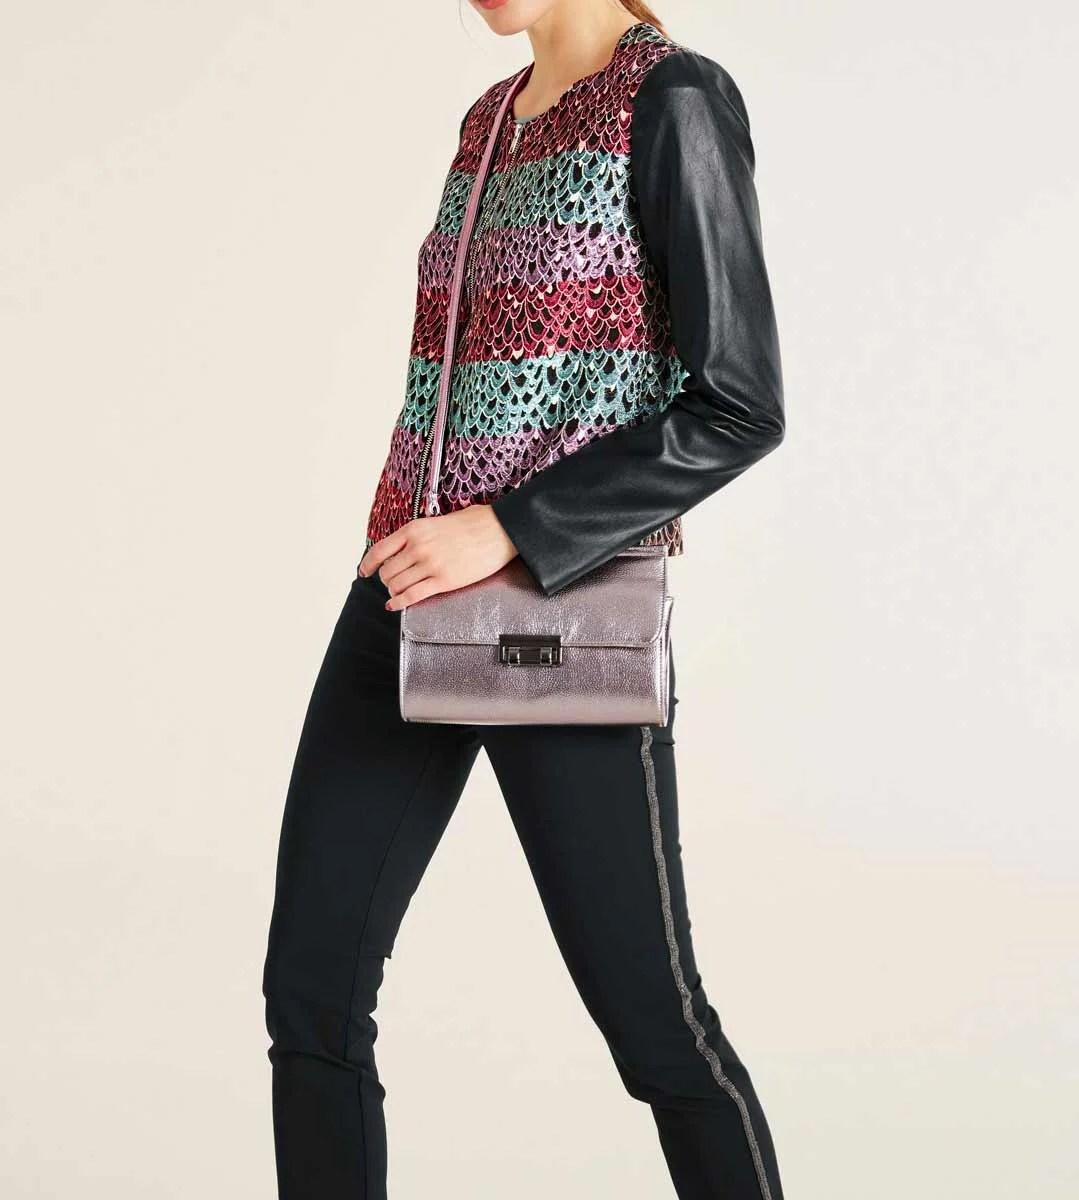 246.570 ASHLEY BROOKE Damen Designer-Blazer Schwarz-Bunt Lederimitat Jacquard Glitzer